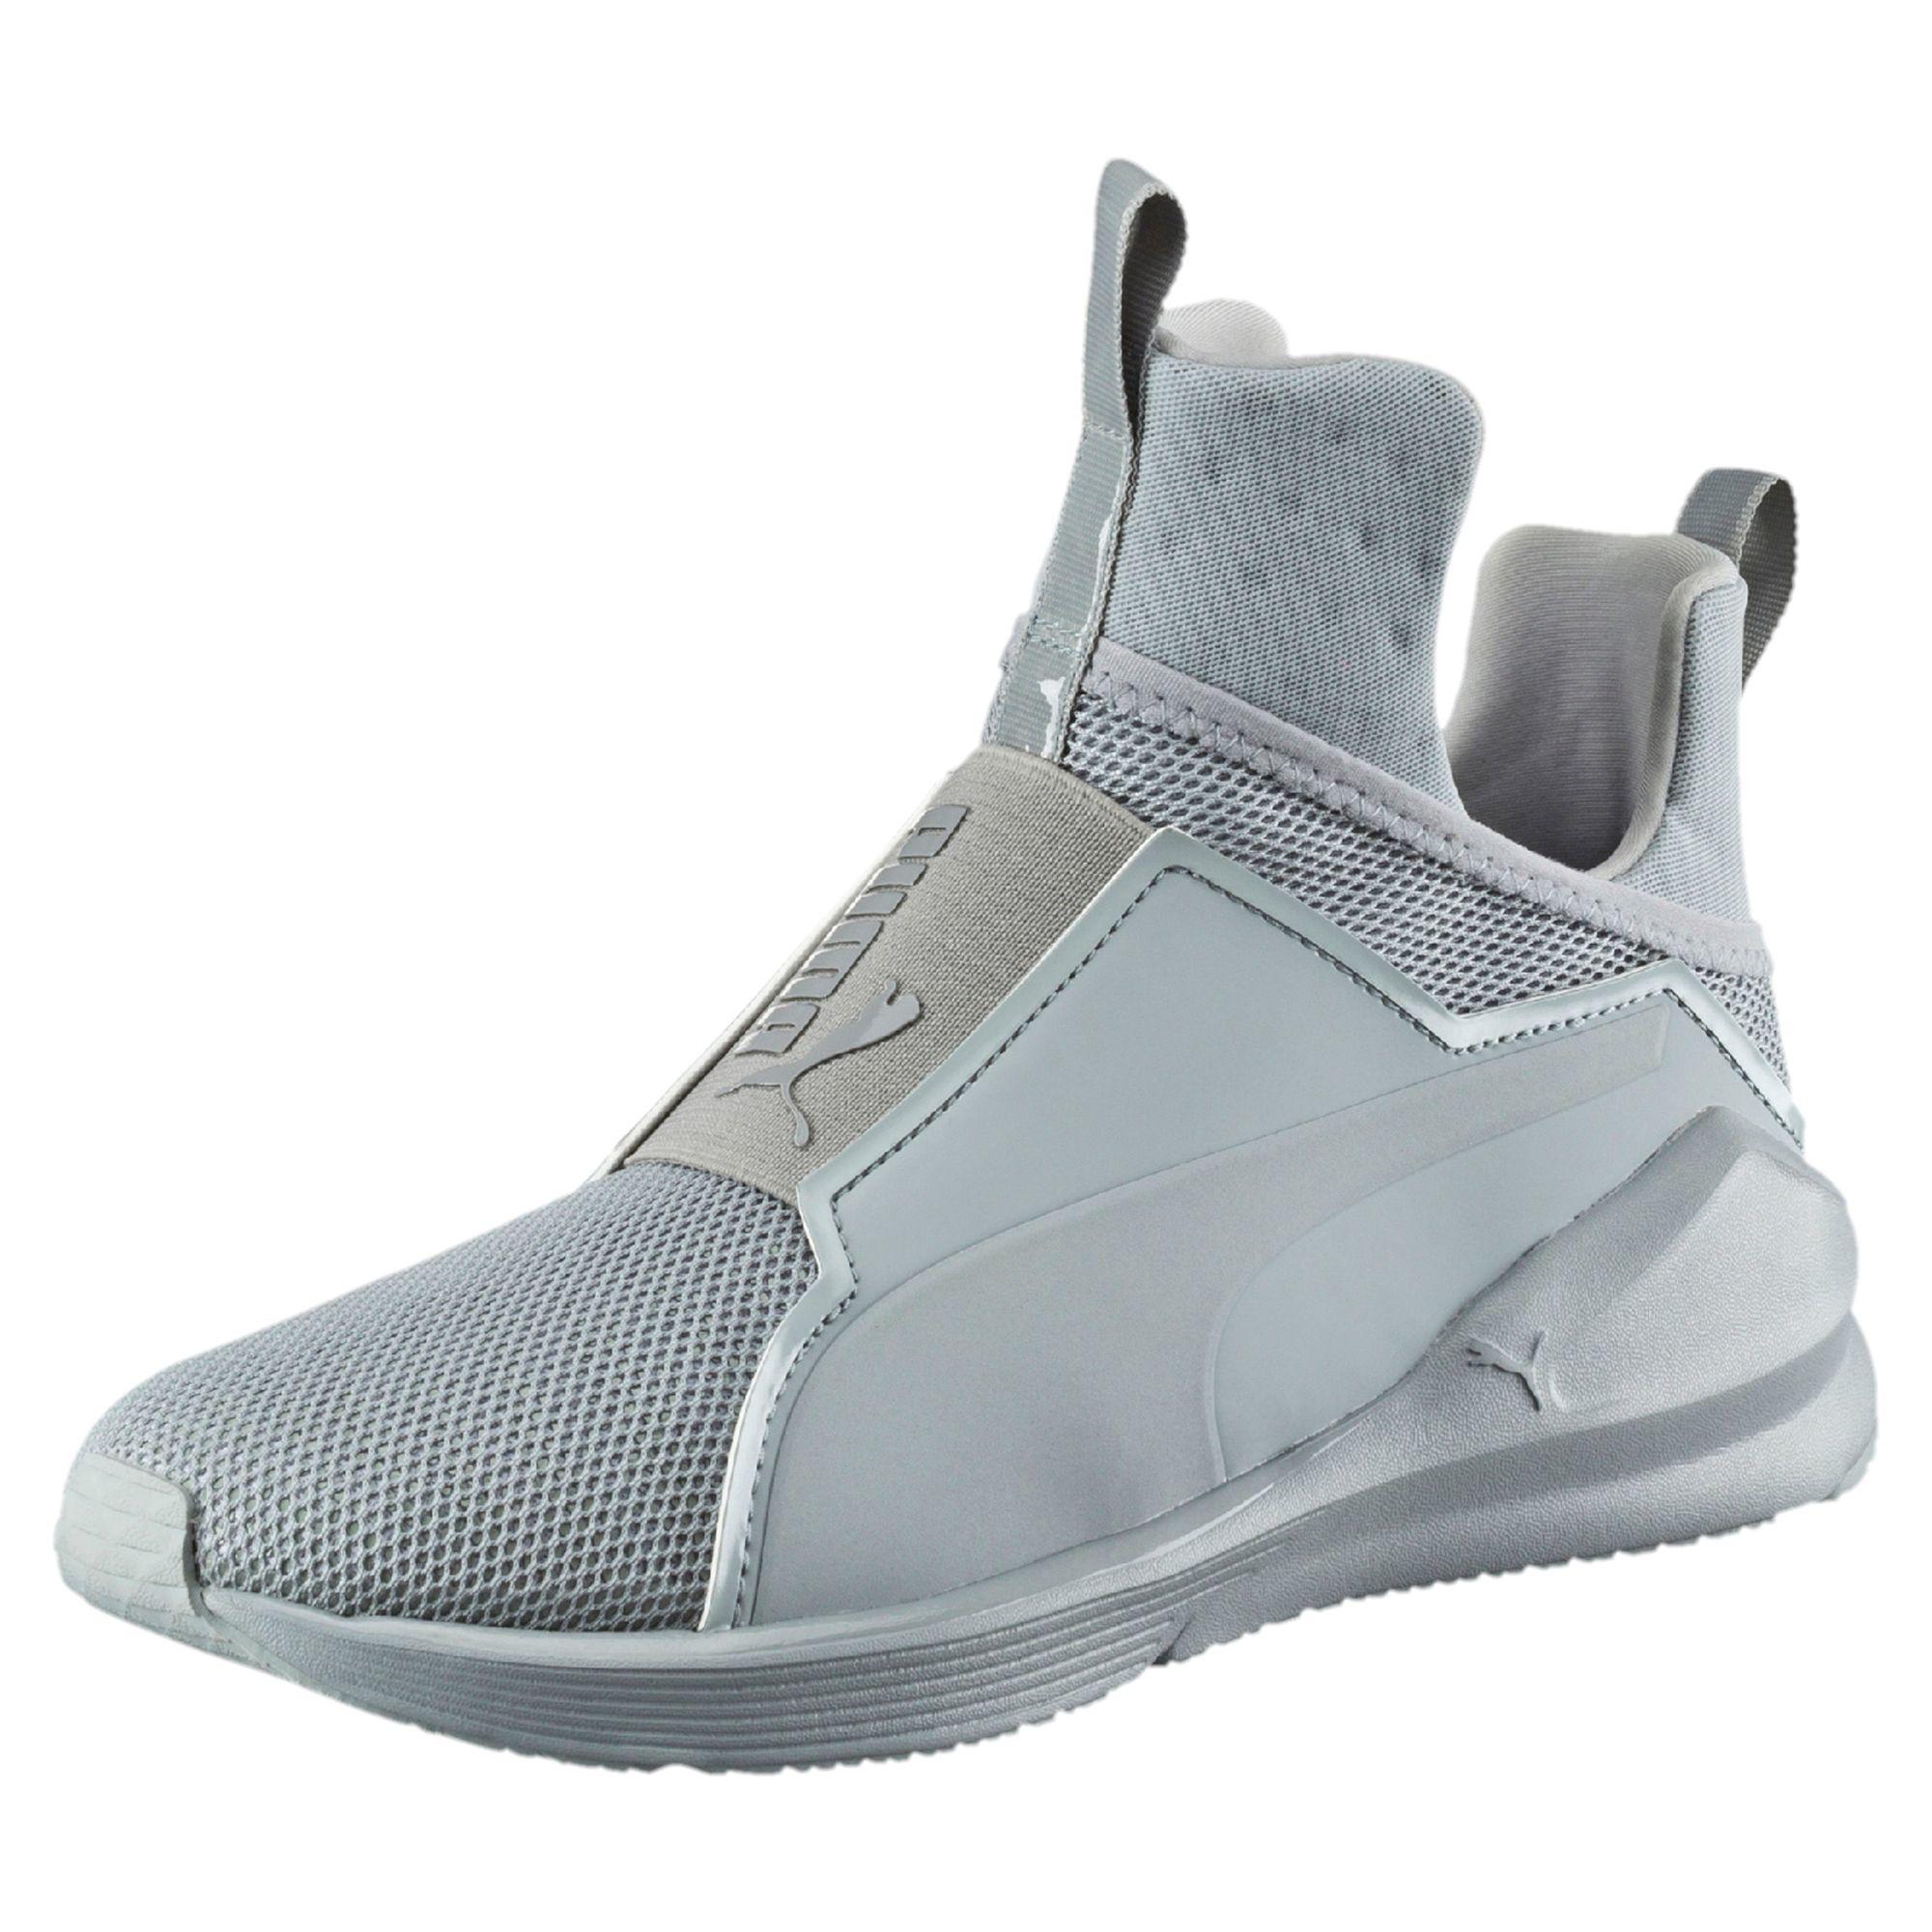 b450bcf3da5f Lyst - PUMA Fierce Shine Women s Training Shoes in White